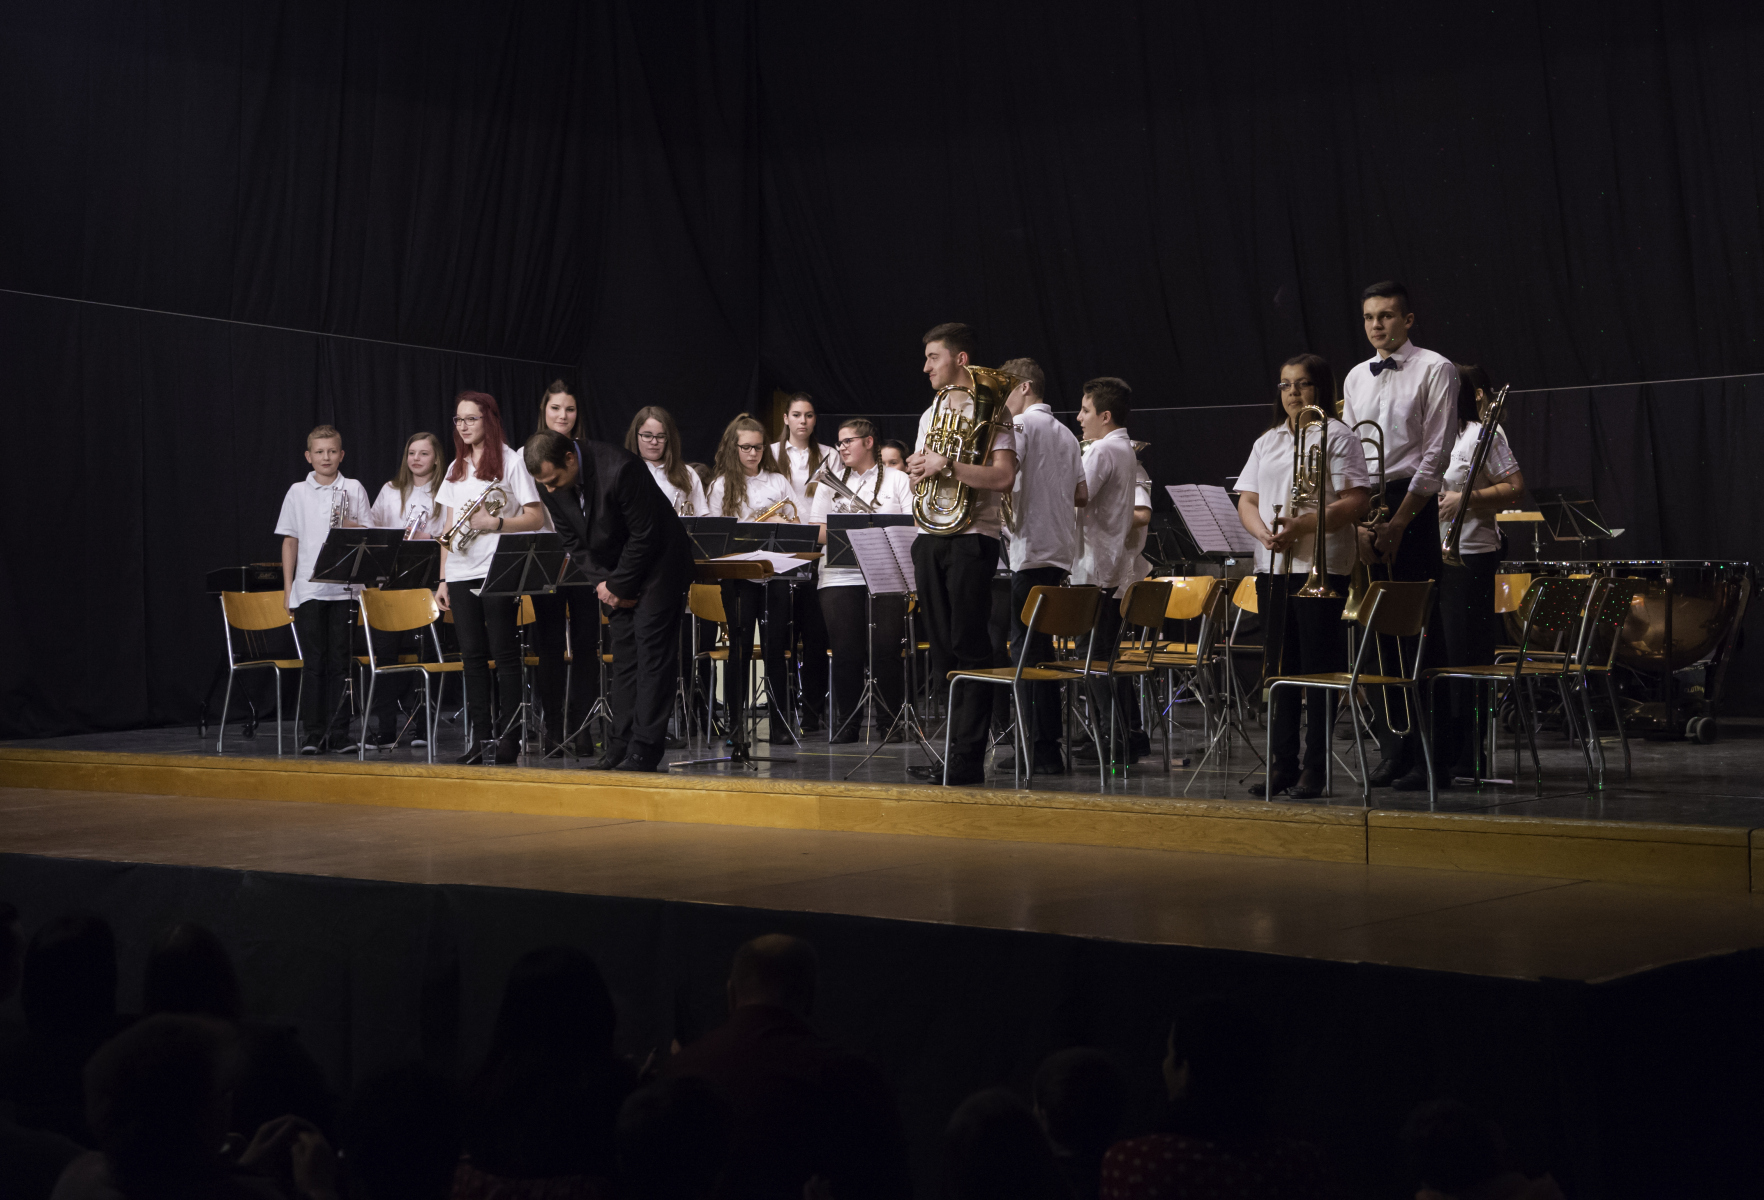 170211_concert_annuel17-014